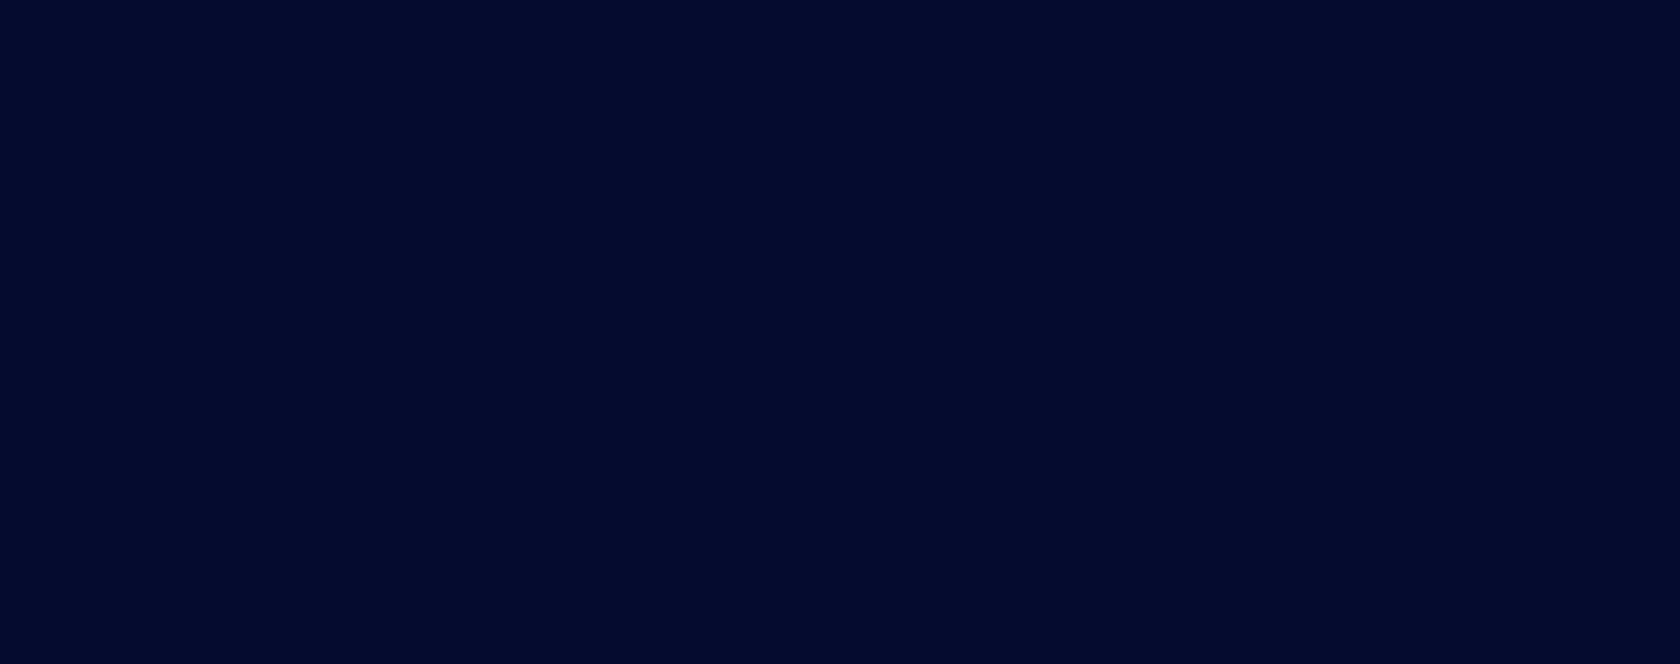 fundo-tec-blue